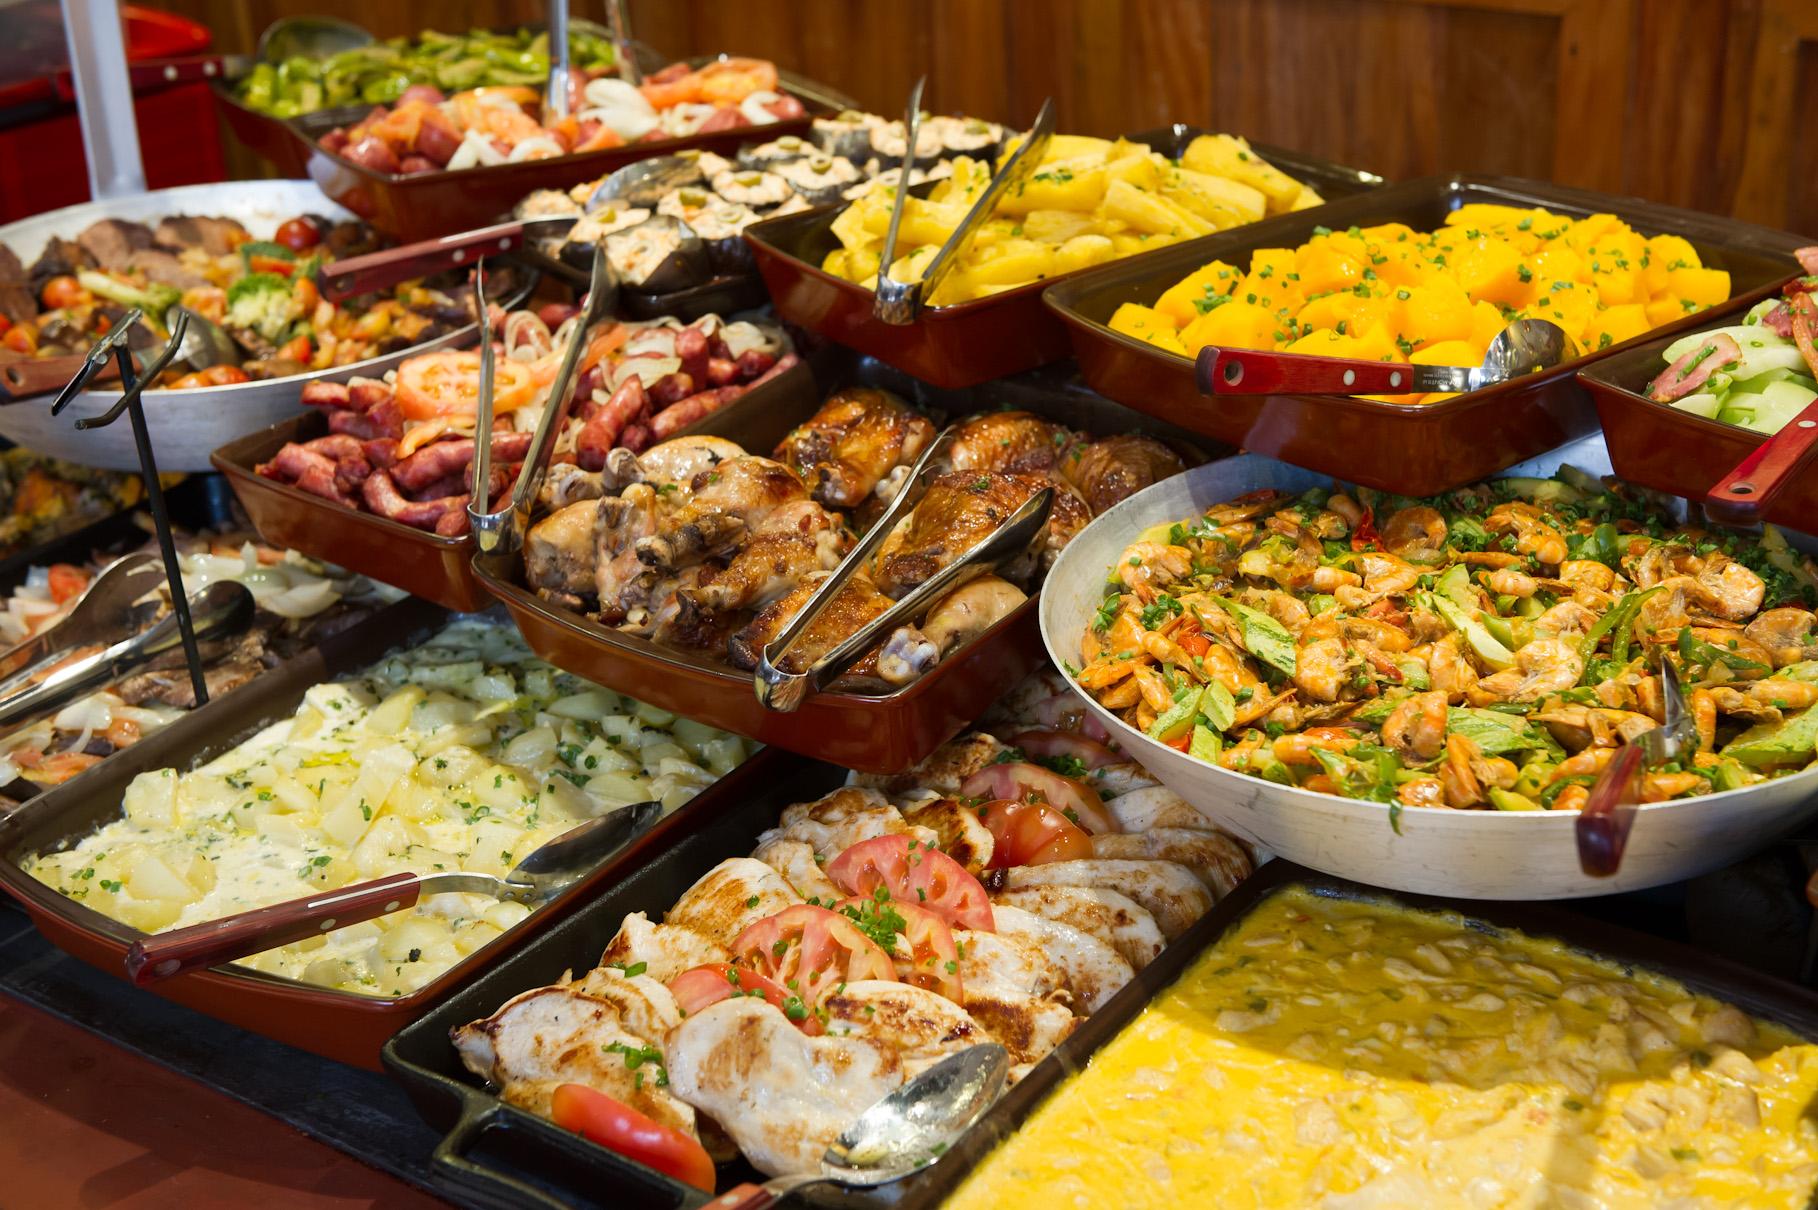 5 alimentos que debes tratar de eliminar de tu dieta para vivir mejor - Comidas para cumpleanos en casa ...